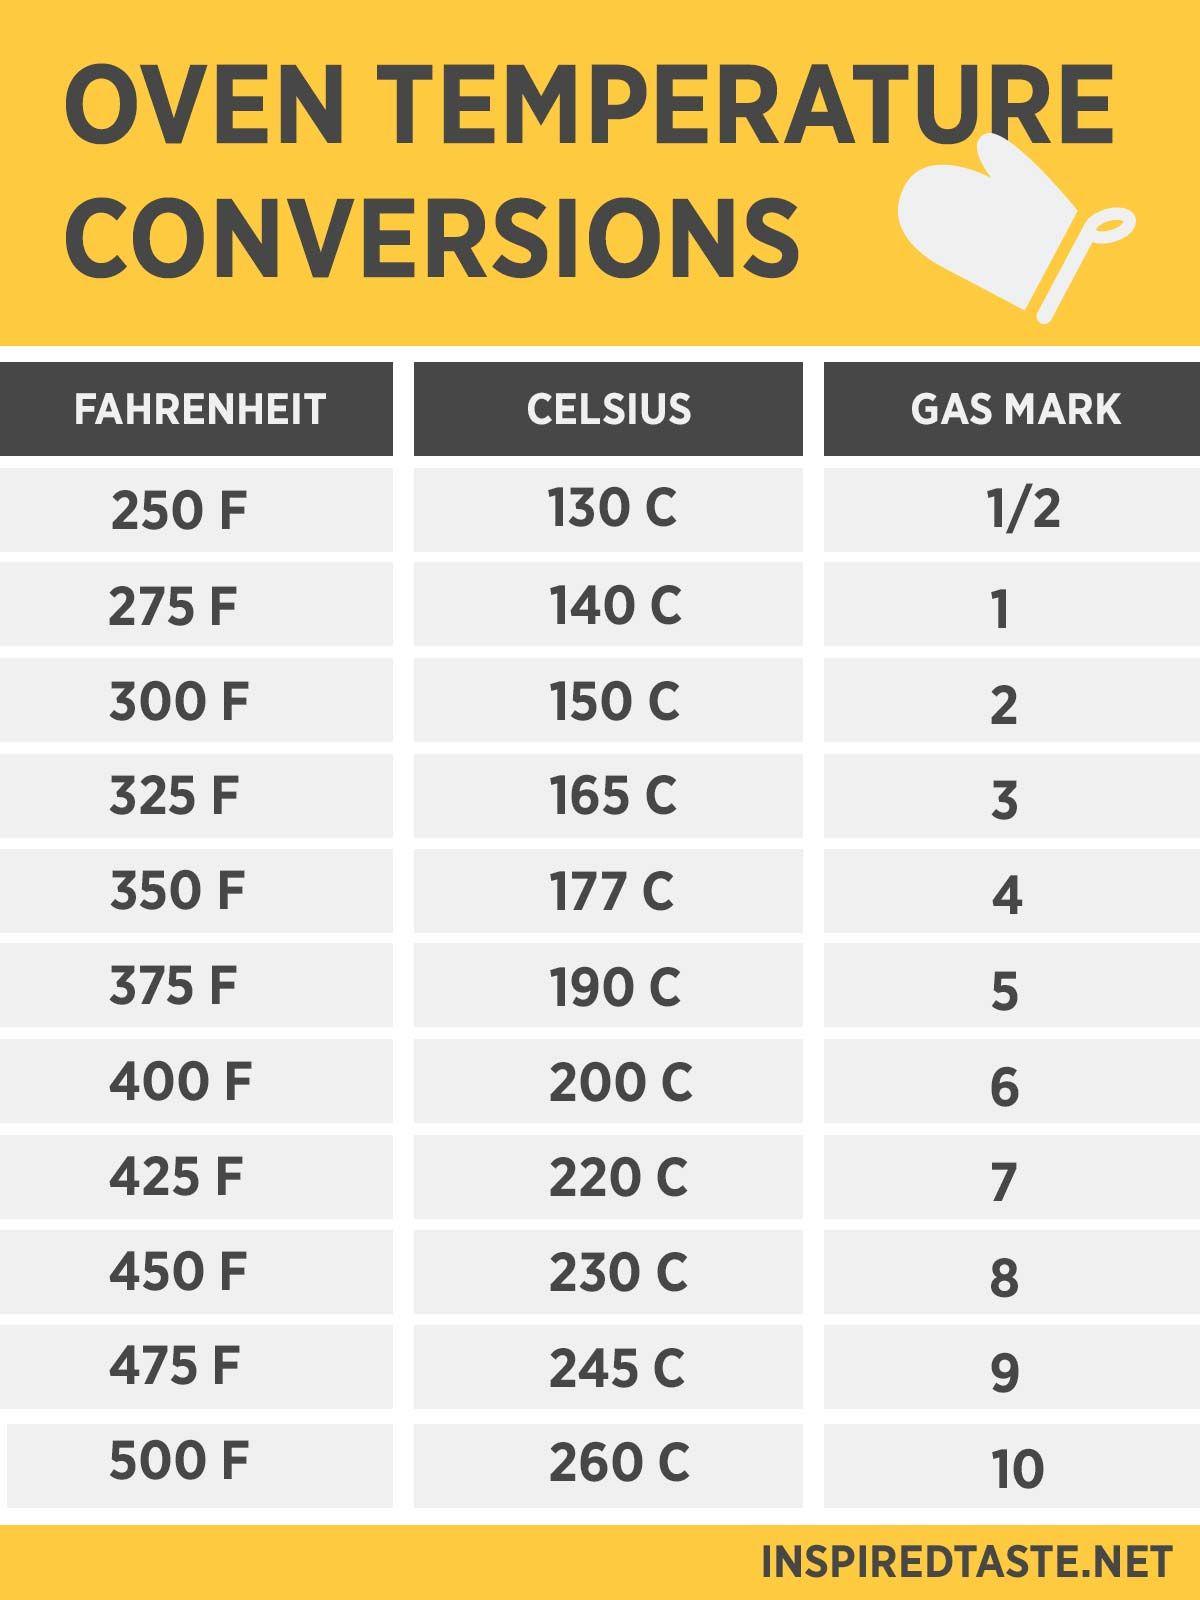 180 Centigrade To Fahrenheit : centigrade, fahrenheit, Temperature, Conversion, Conversion,, Baking, Chart,, Cooking, Conversions